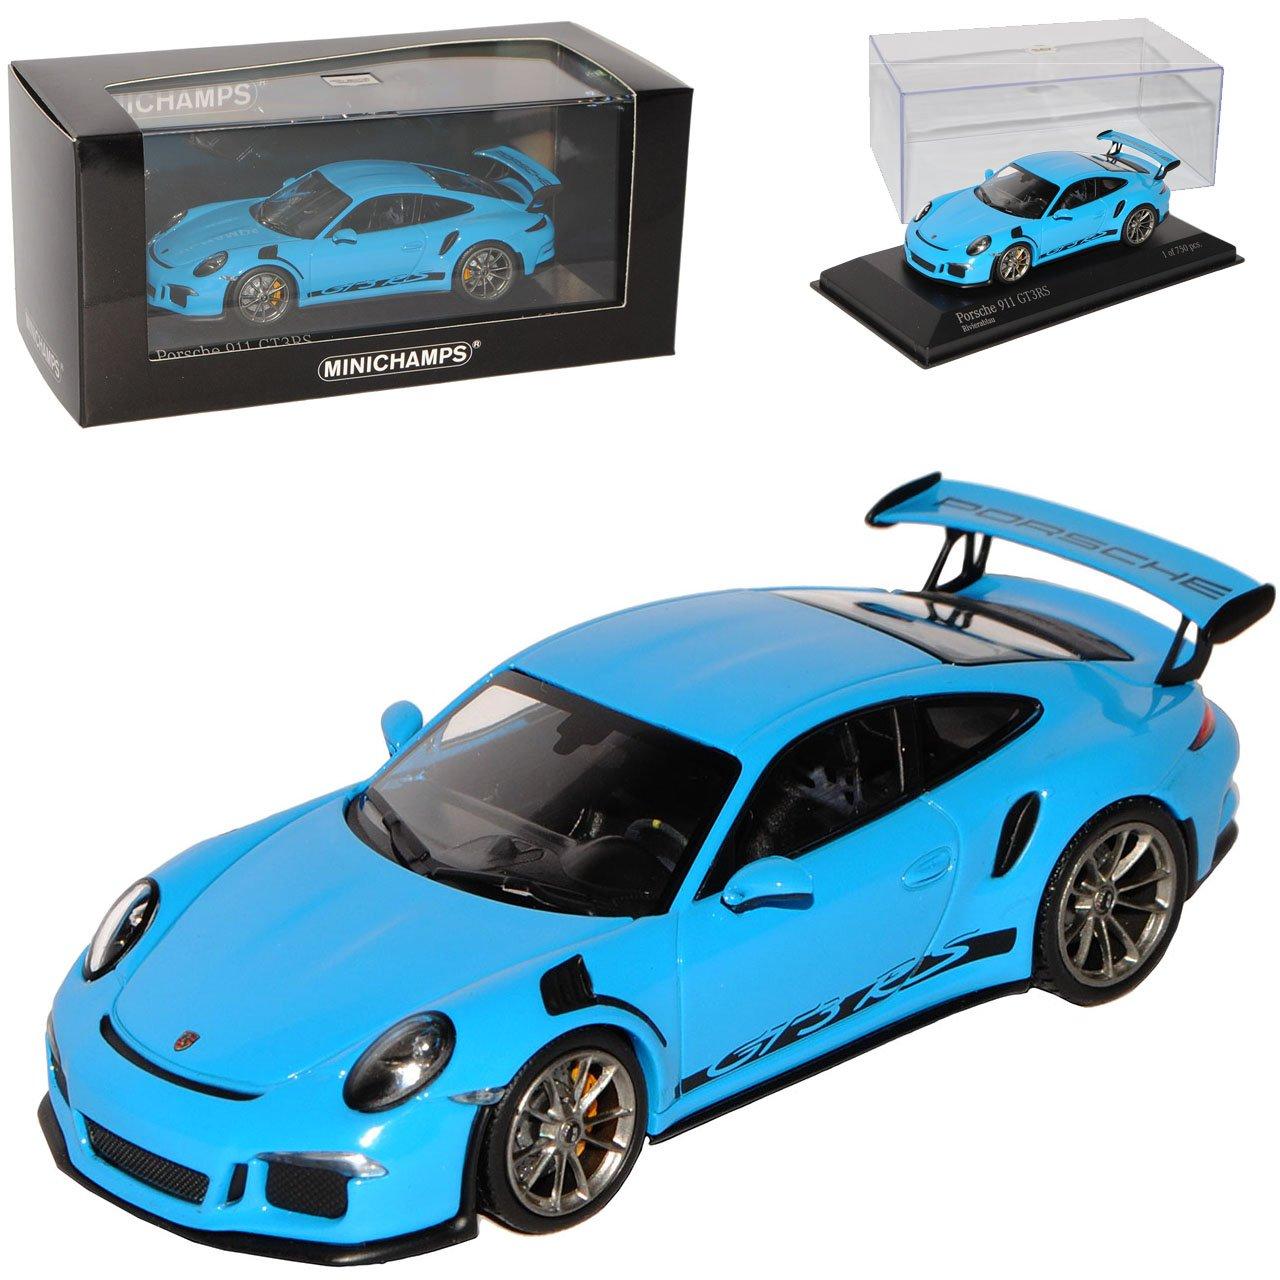 Minichamps Porsche 911 991 GT3 RS Riviera Blau Ab 2013 1/43 Modell Auto